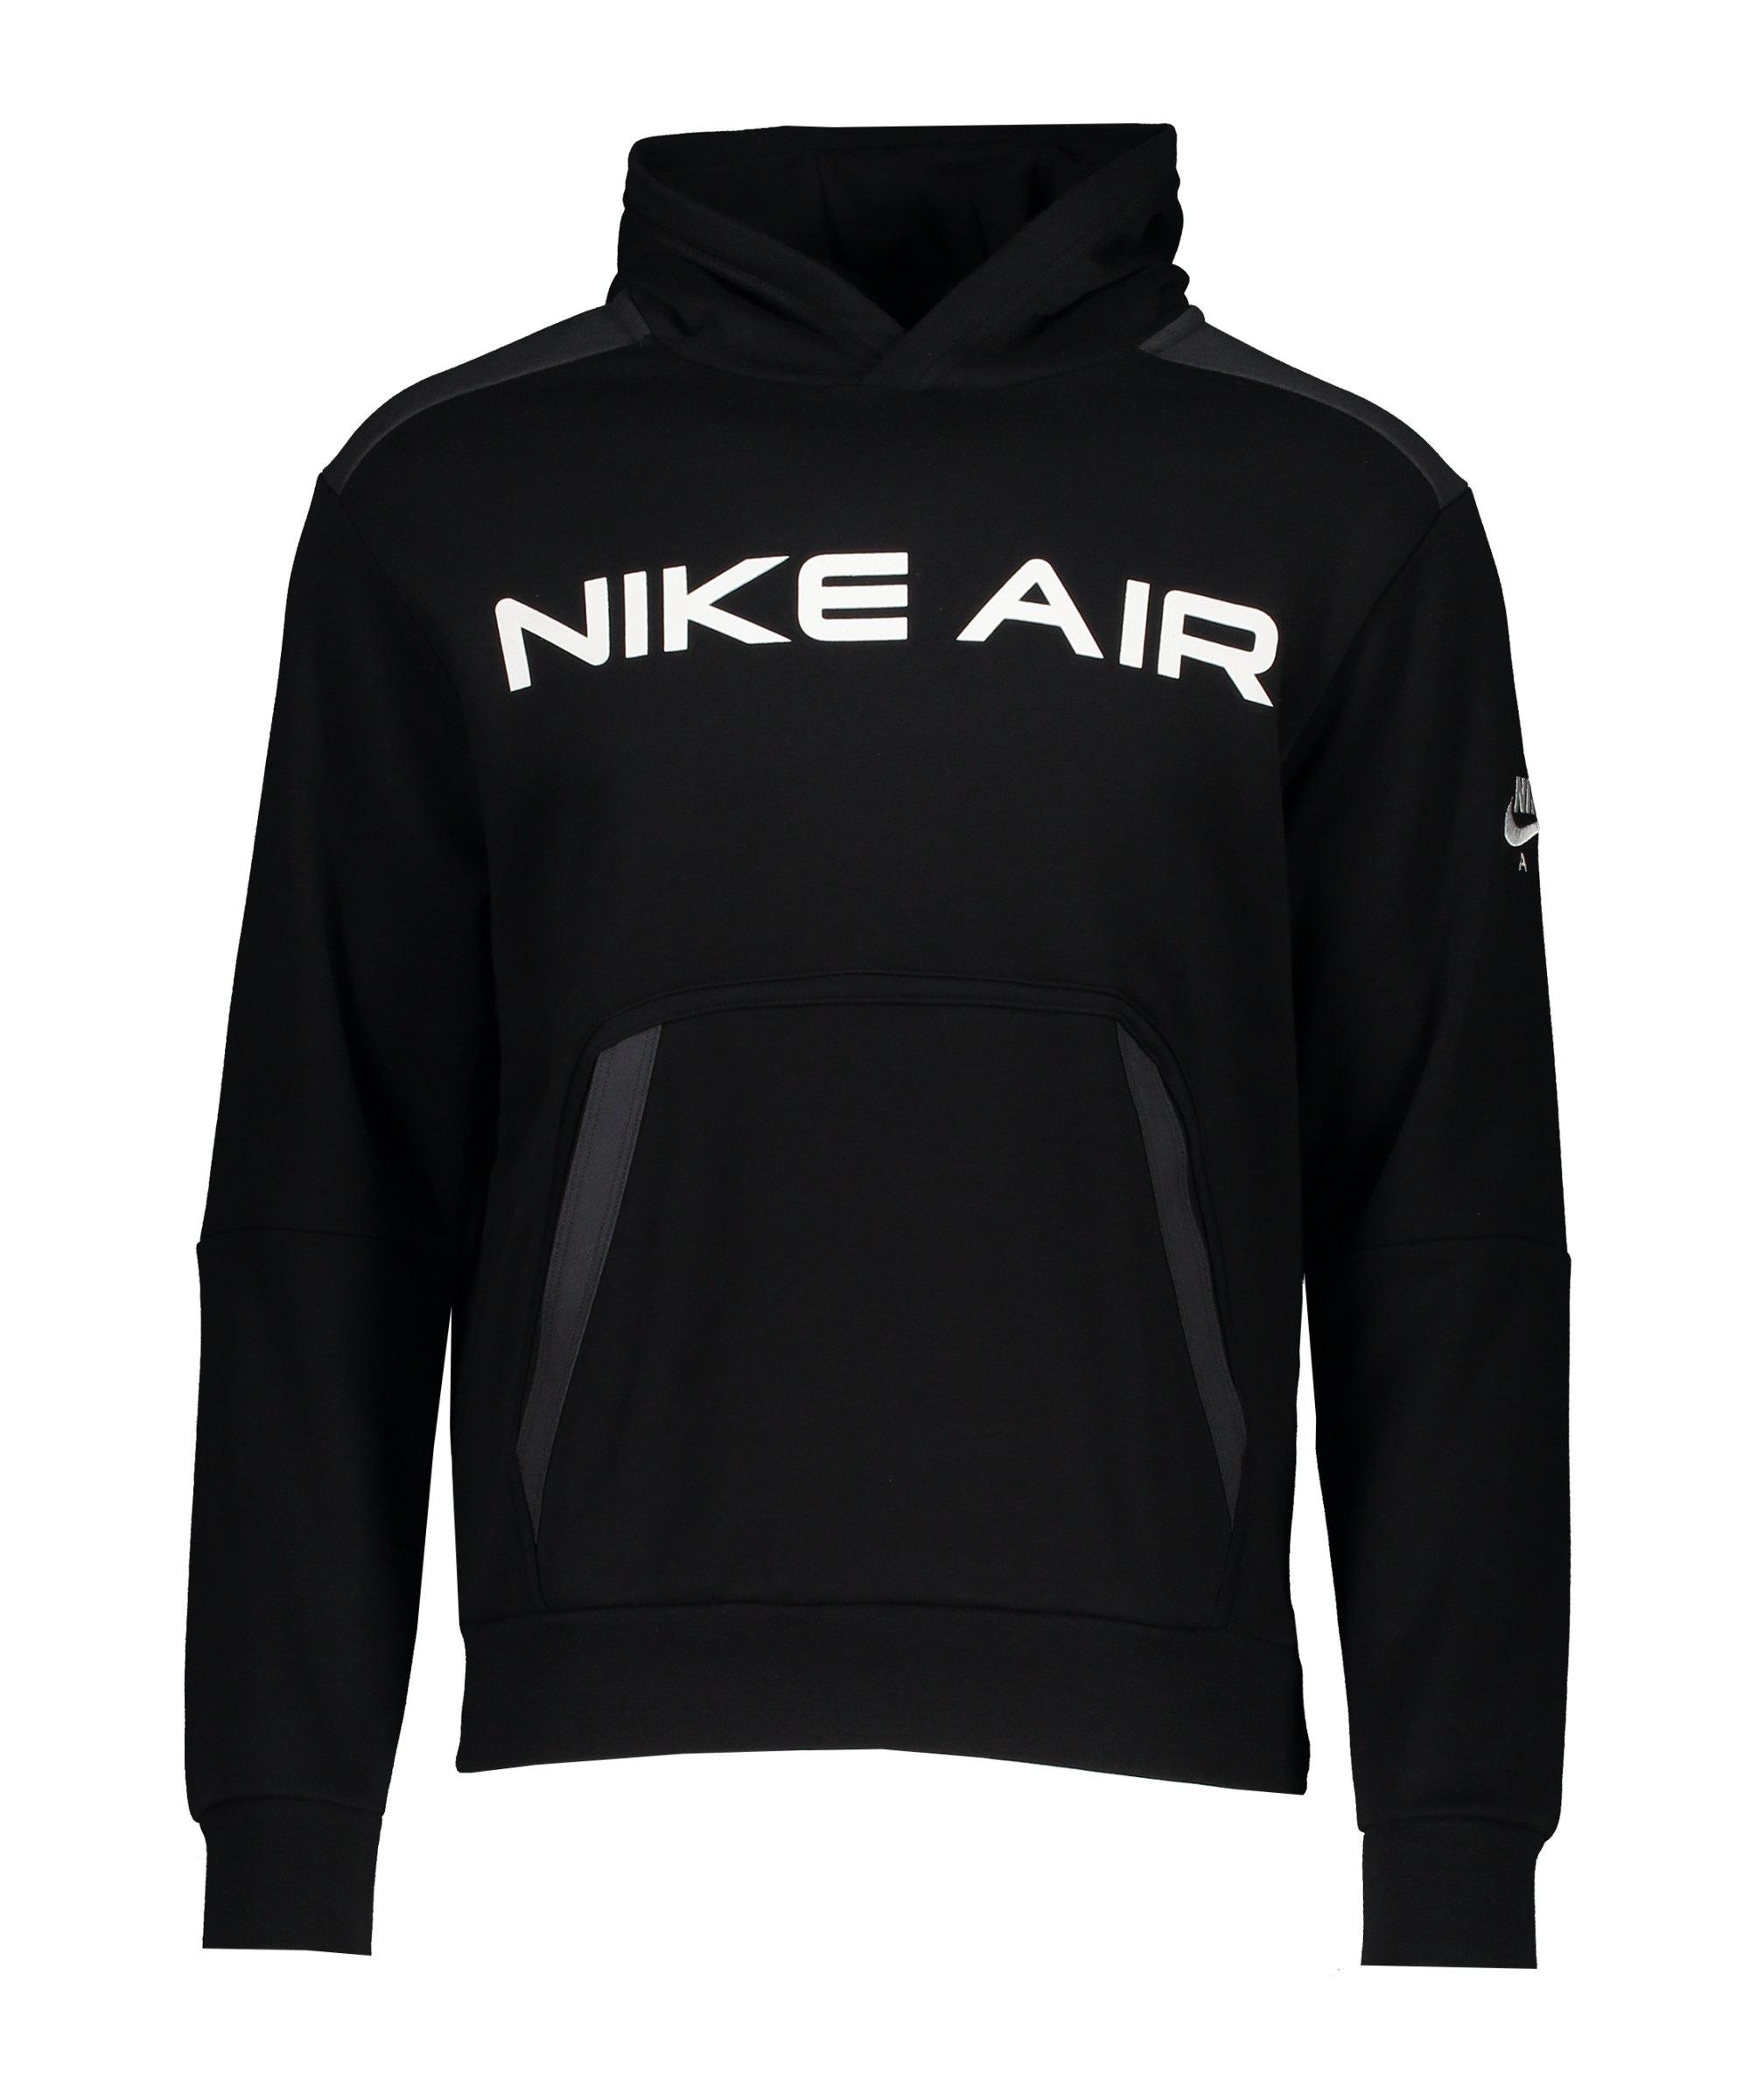 Nike Air Fleece Hoody Schwarz Grau F010 - schwarz